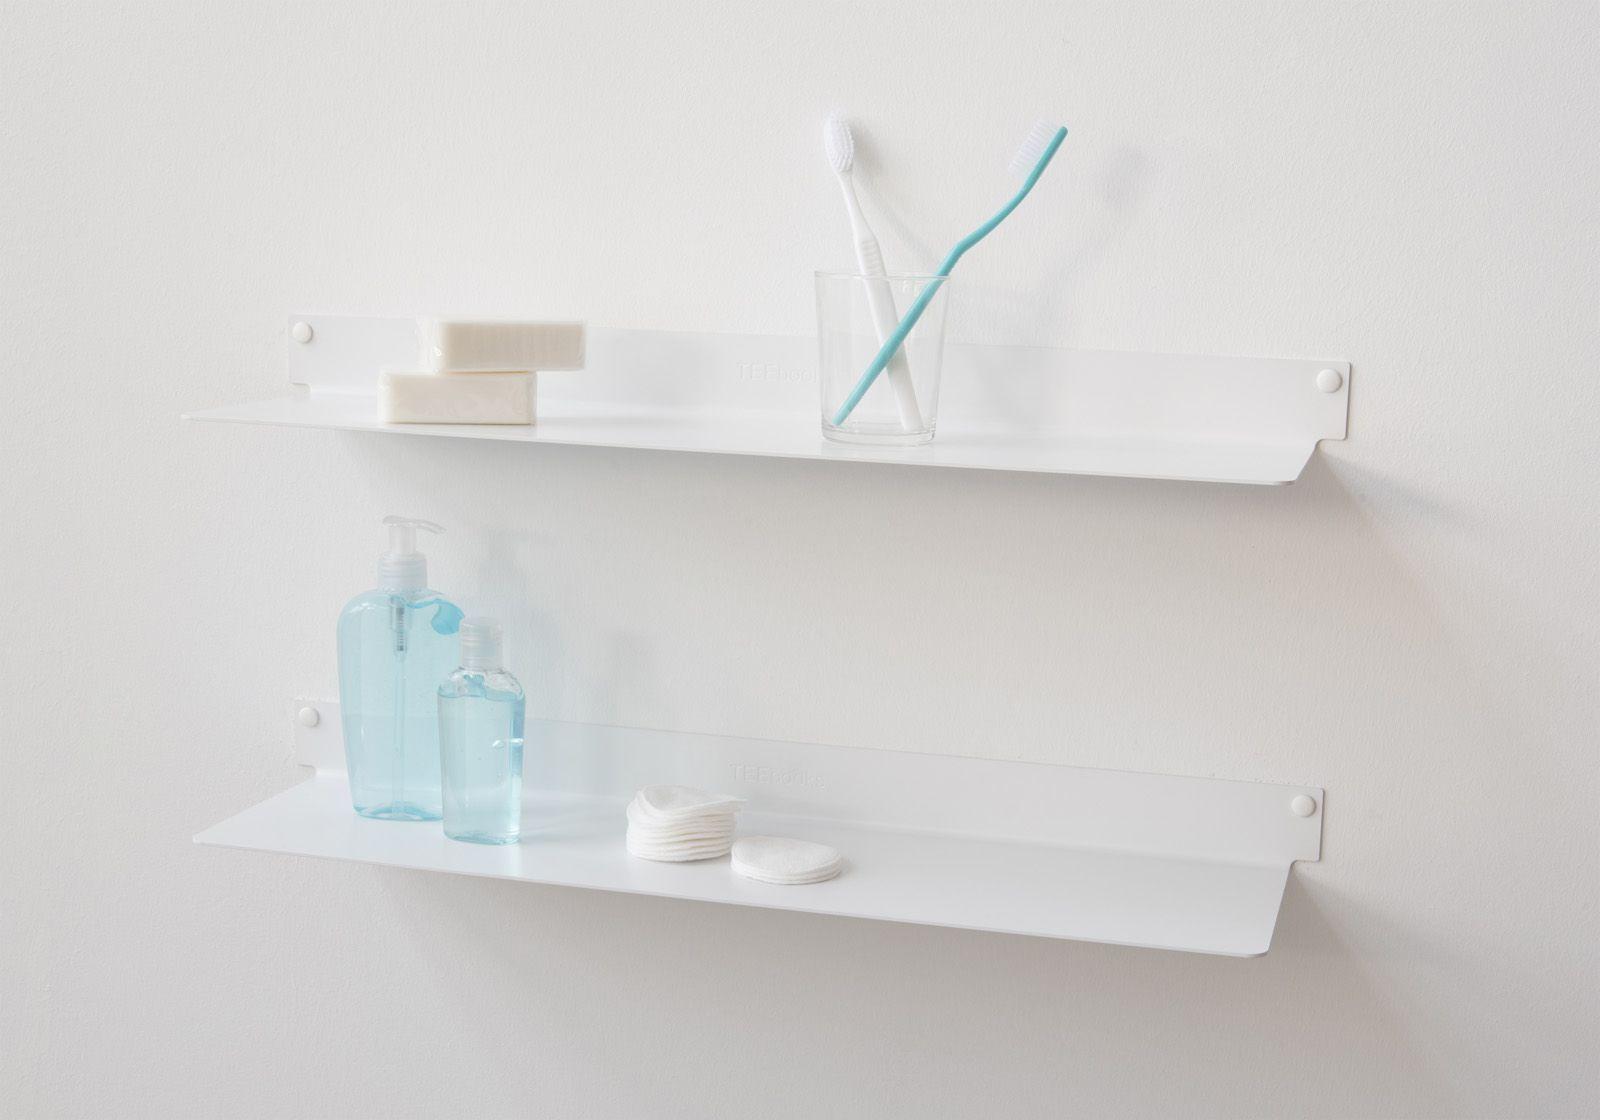 badregale teeline satz von 2 45 cm stahl. Black Bedroom Furniture Sets. Home Design Ideas